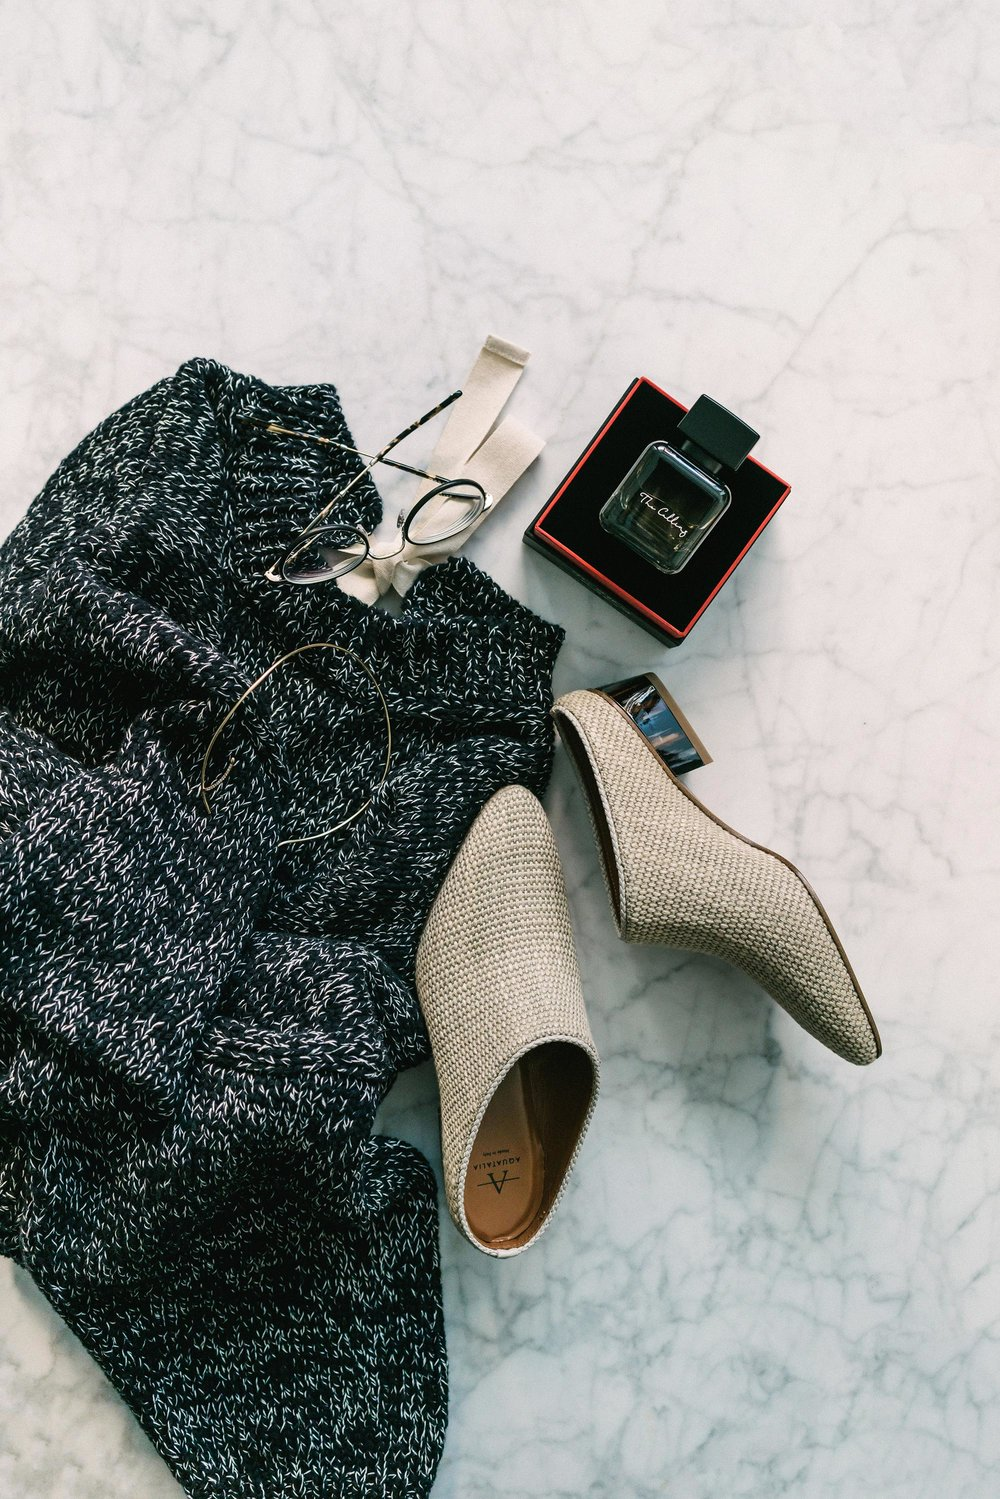 J.W. Anderson Sweater,  Aquatalia Shoes ,  Garrett Leight x Want Les Essentiels Glasses ,  Phuong Dang Fragrance ,  Kat Kim Fine Jewelry Choker